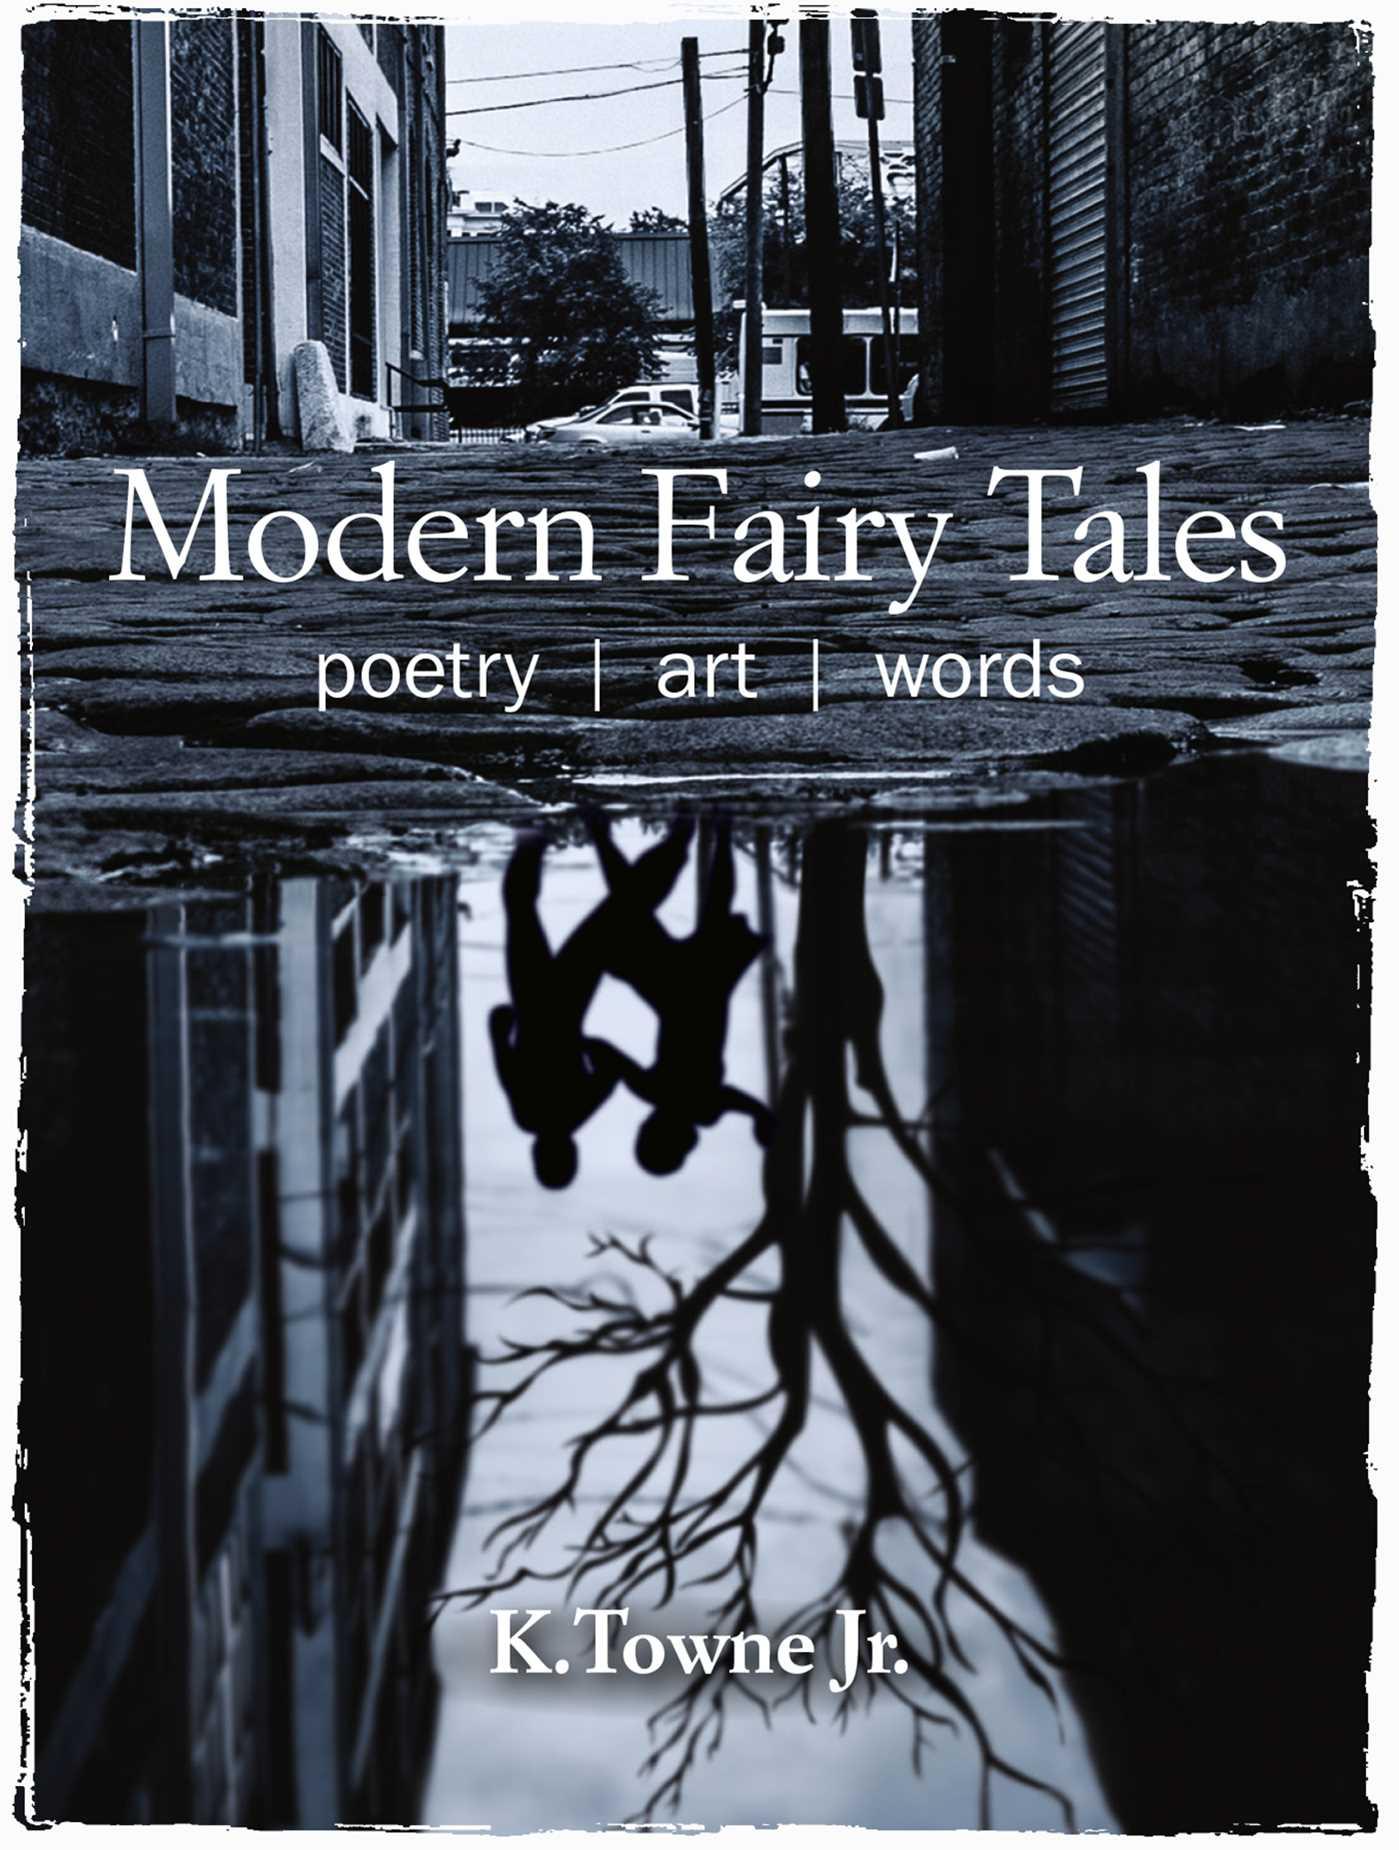 Modern fairy tales 9781782496649 hr